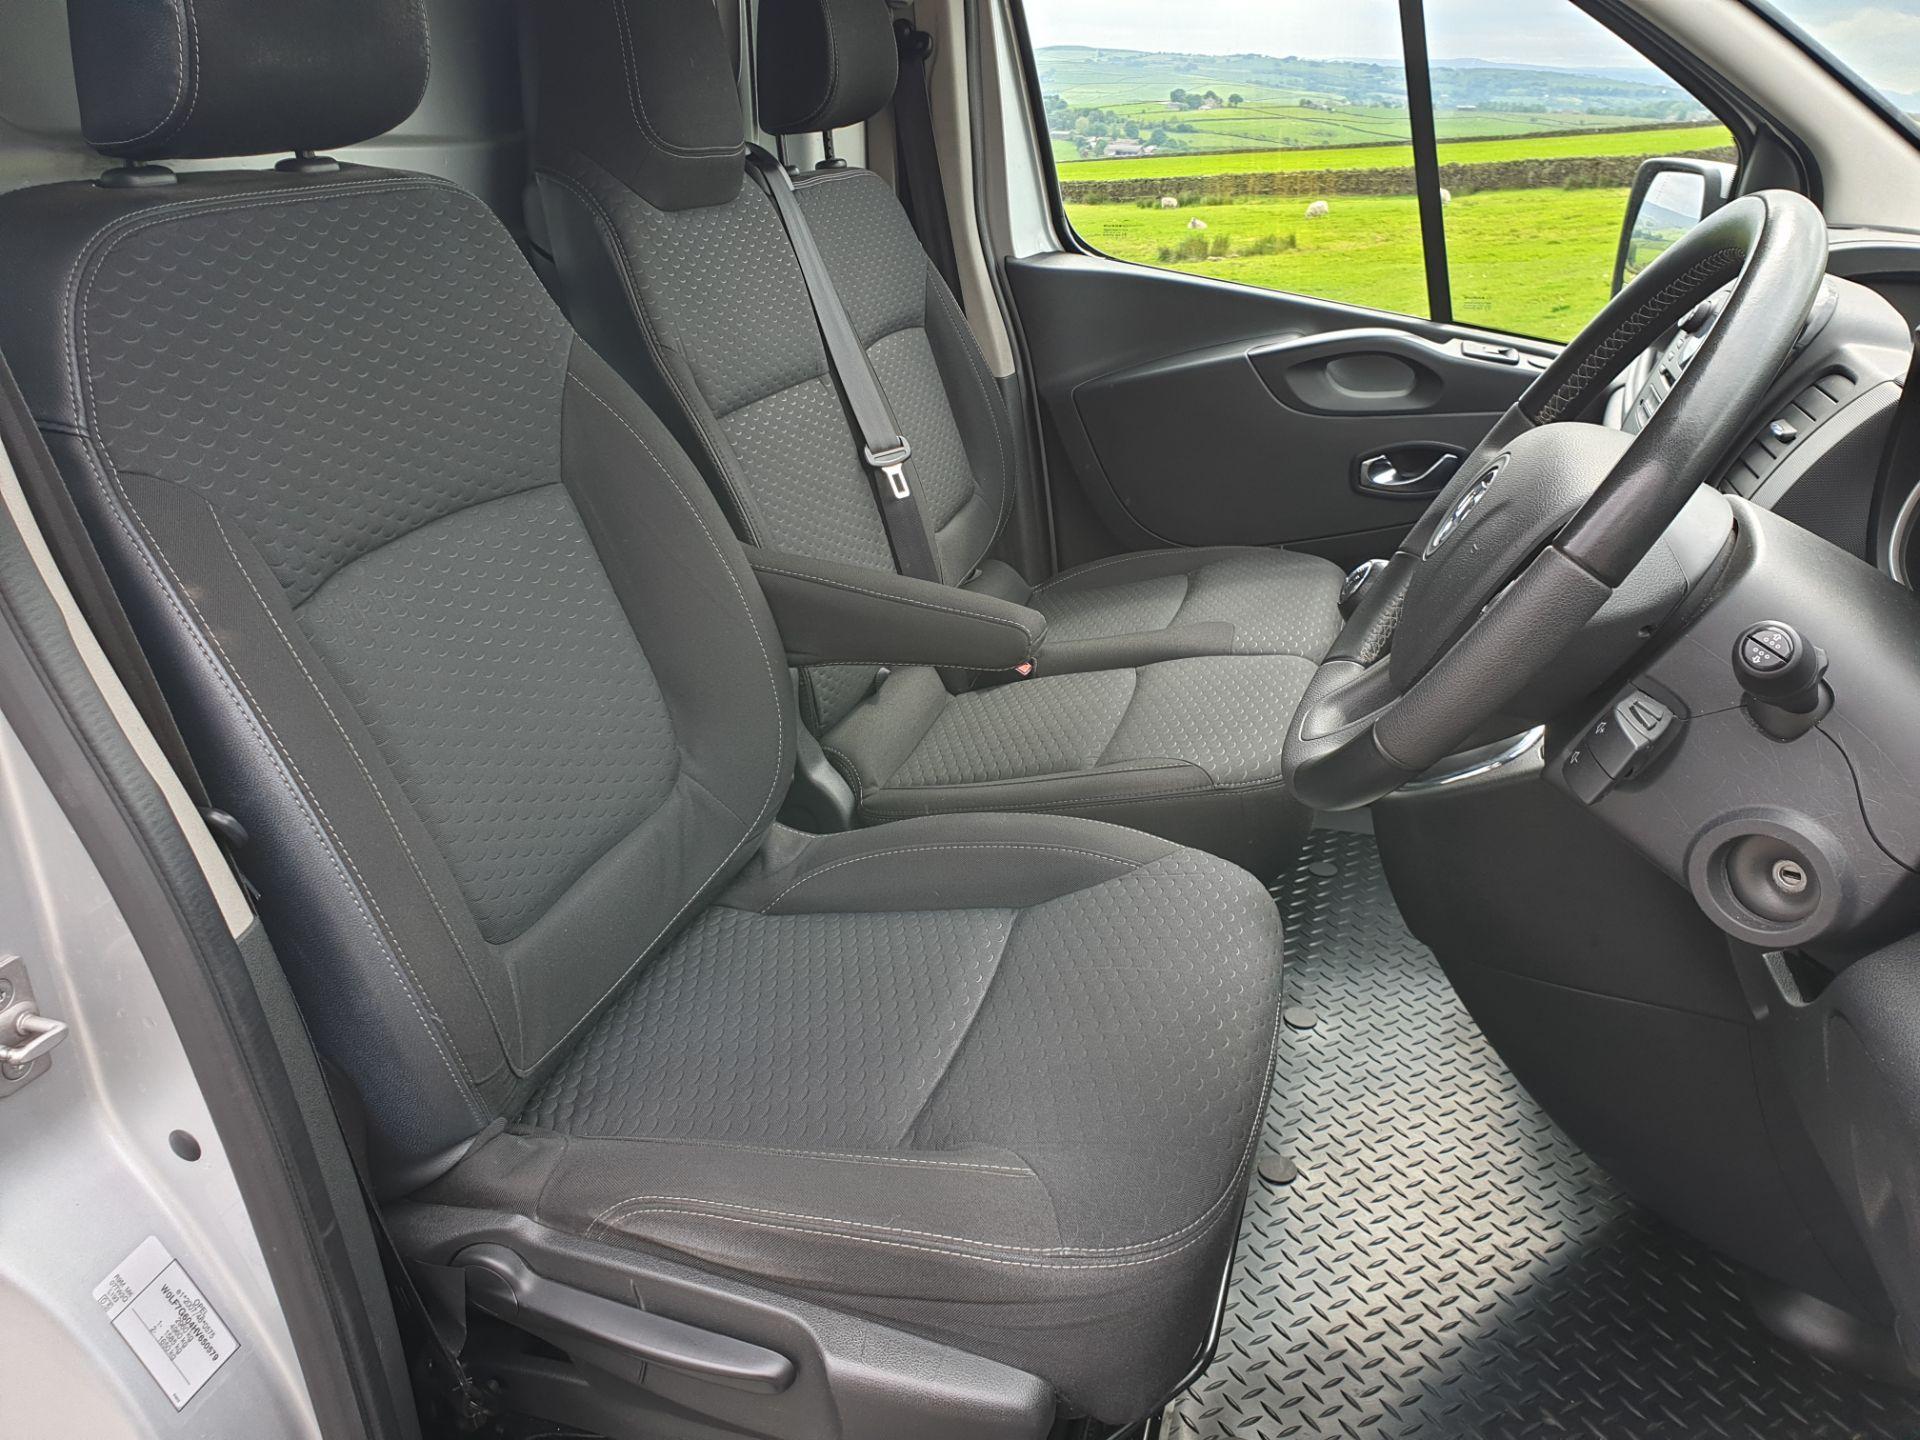 Lot 8 - 2017 / 17 Vauxhall Vivaro Sportive